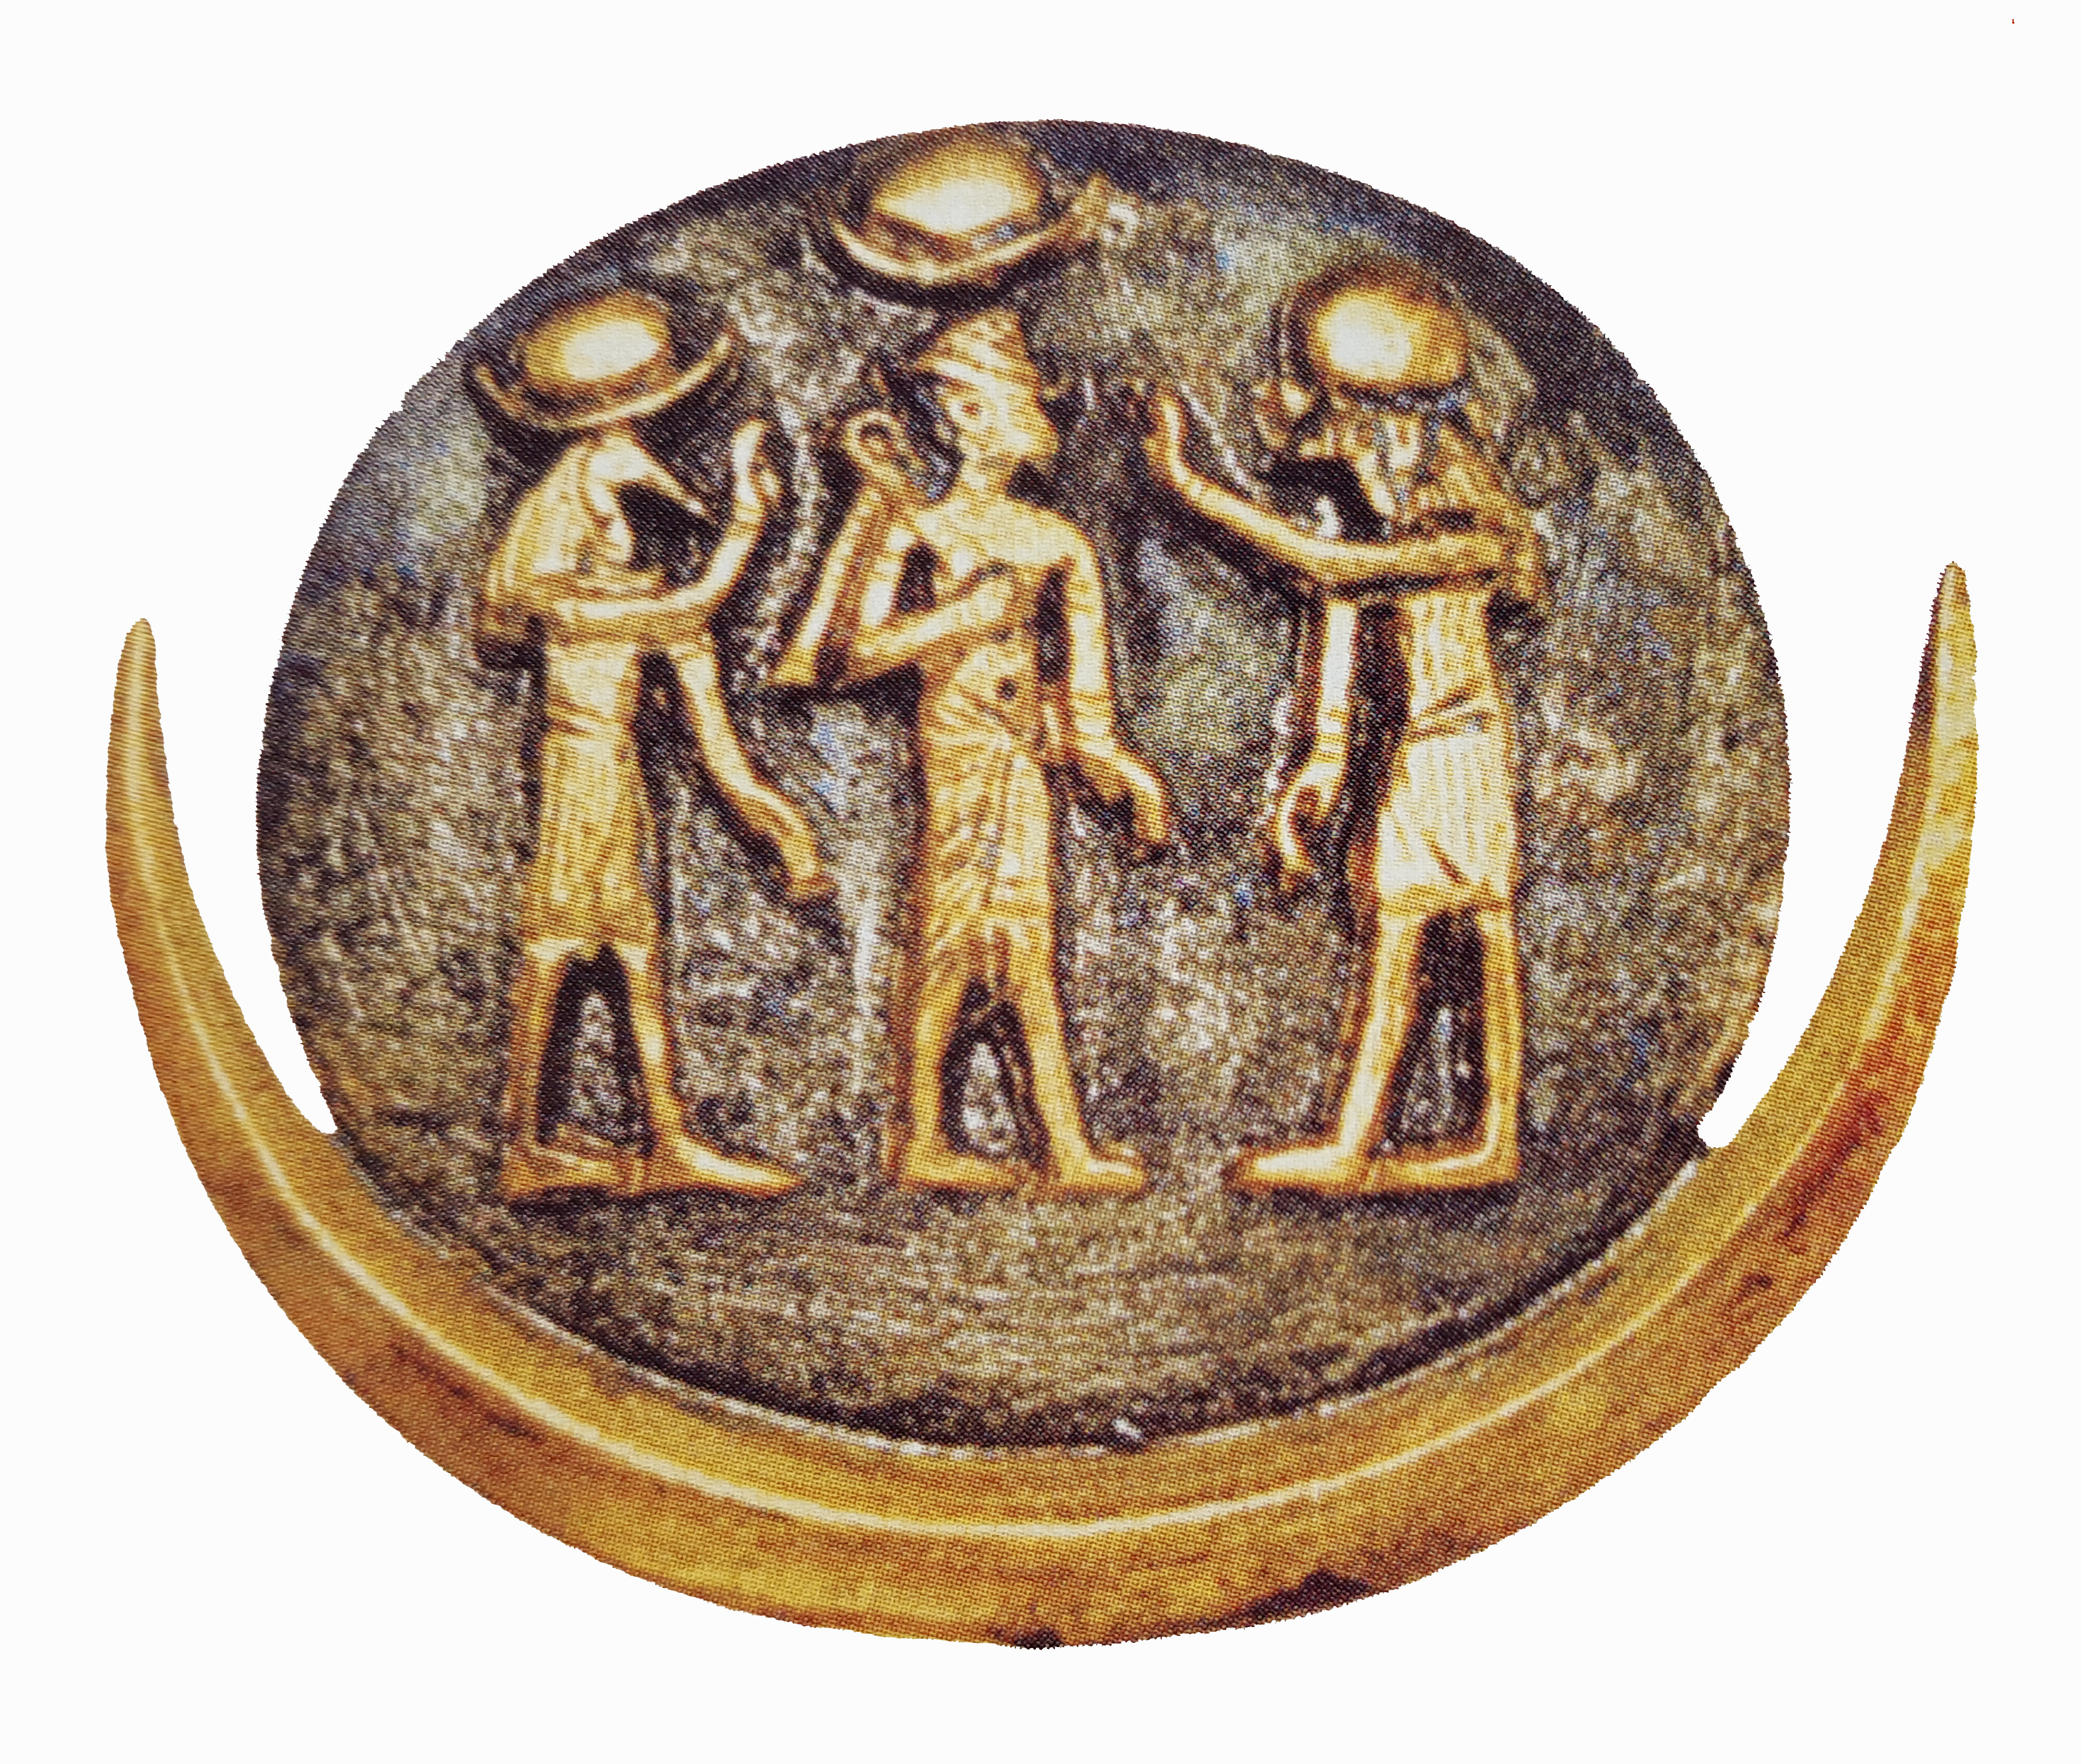 Tutankhamun Thoth Ra-Horakhty